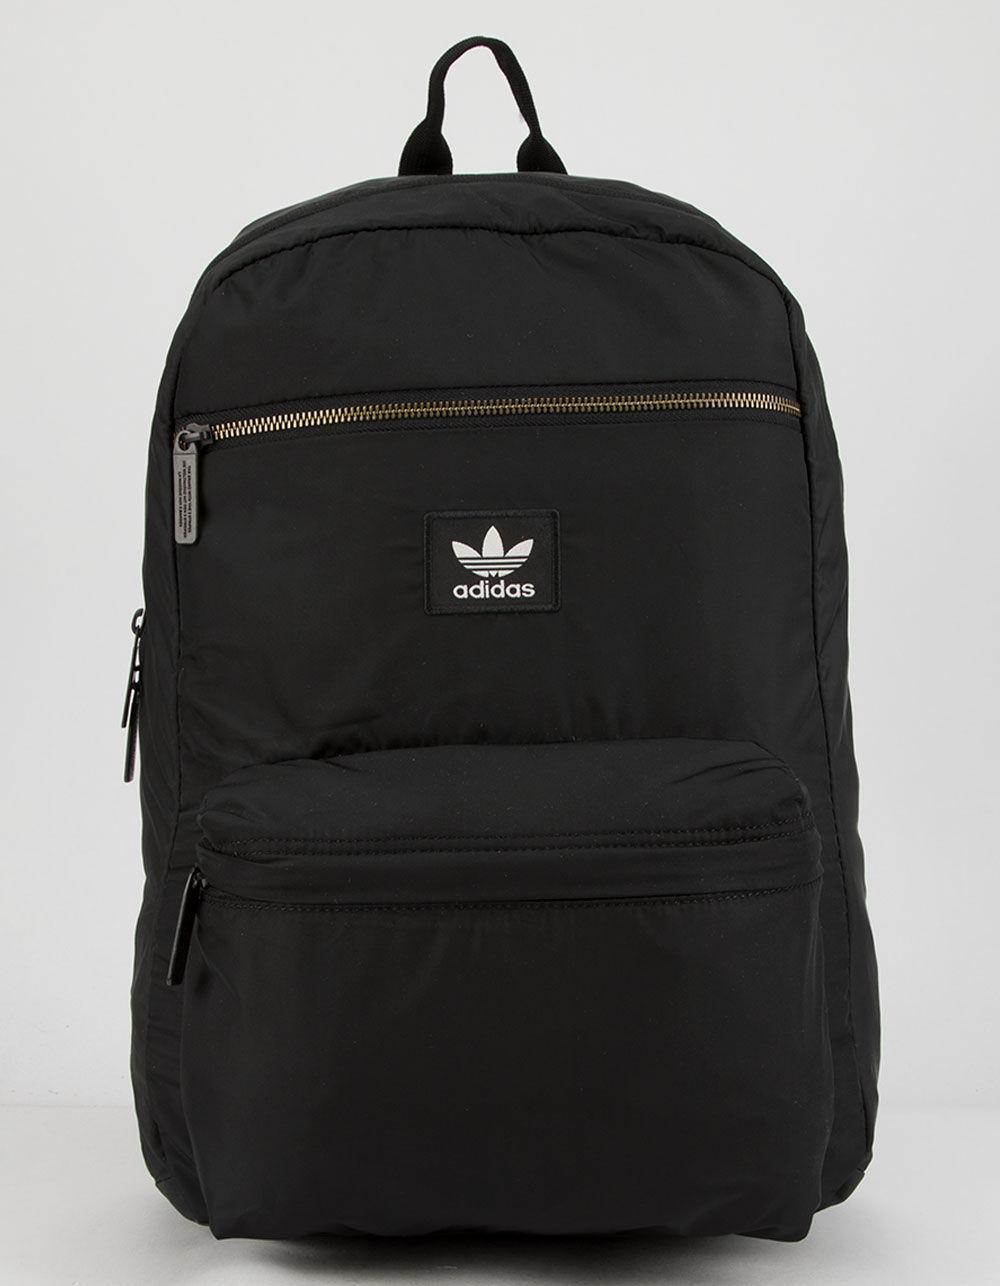 ef7df9828b98 Adidas - Black Originals National Plus Backpack - Lyst. View fullscreen